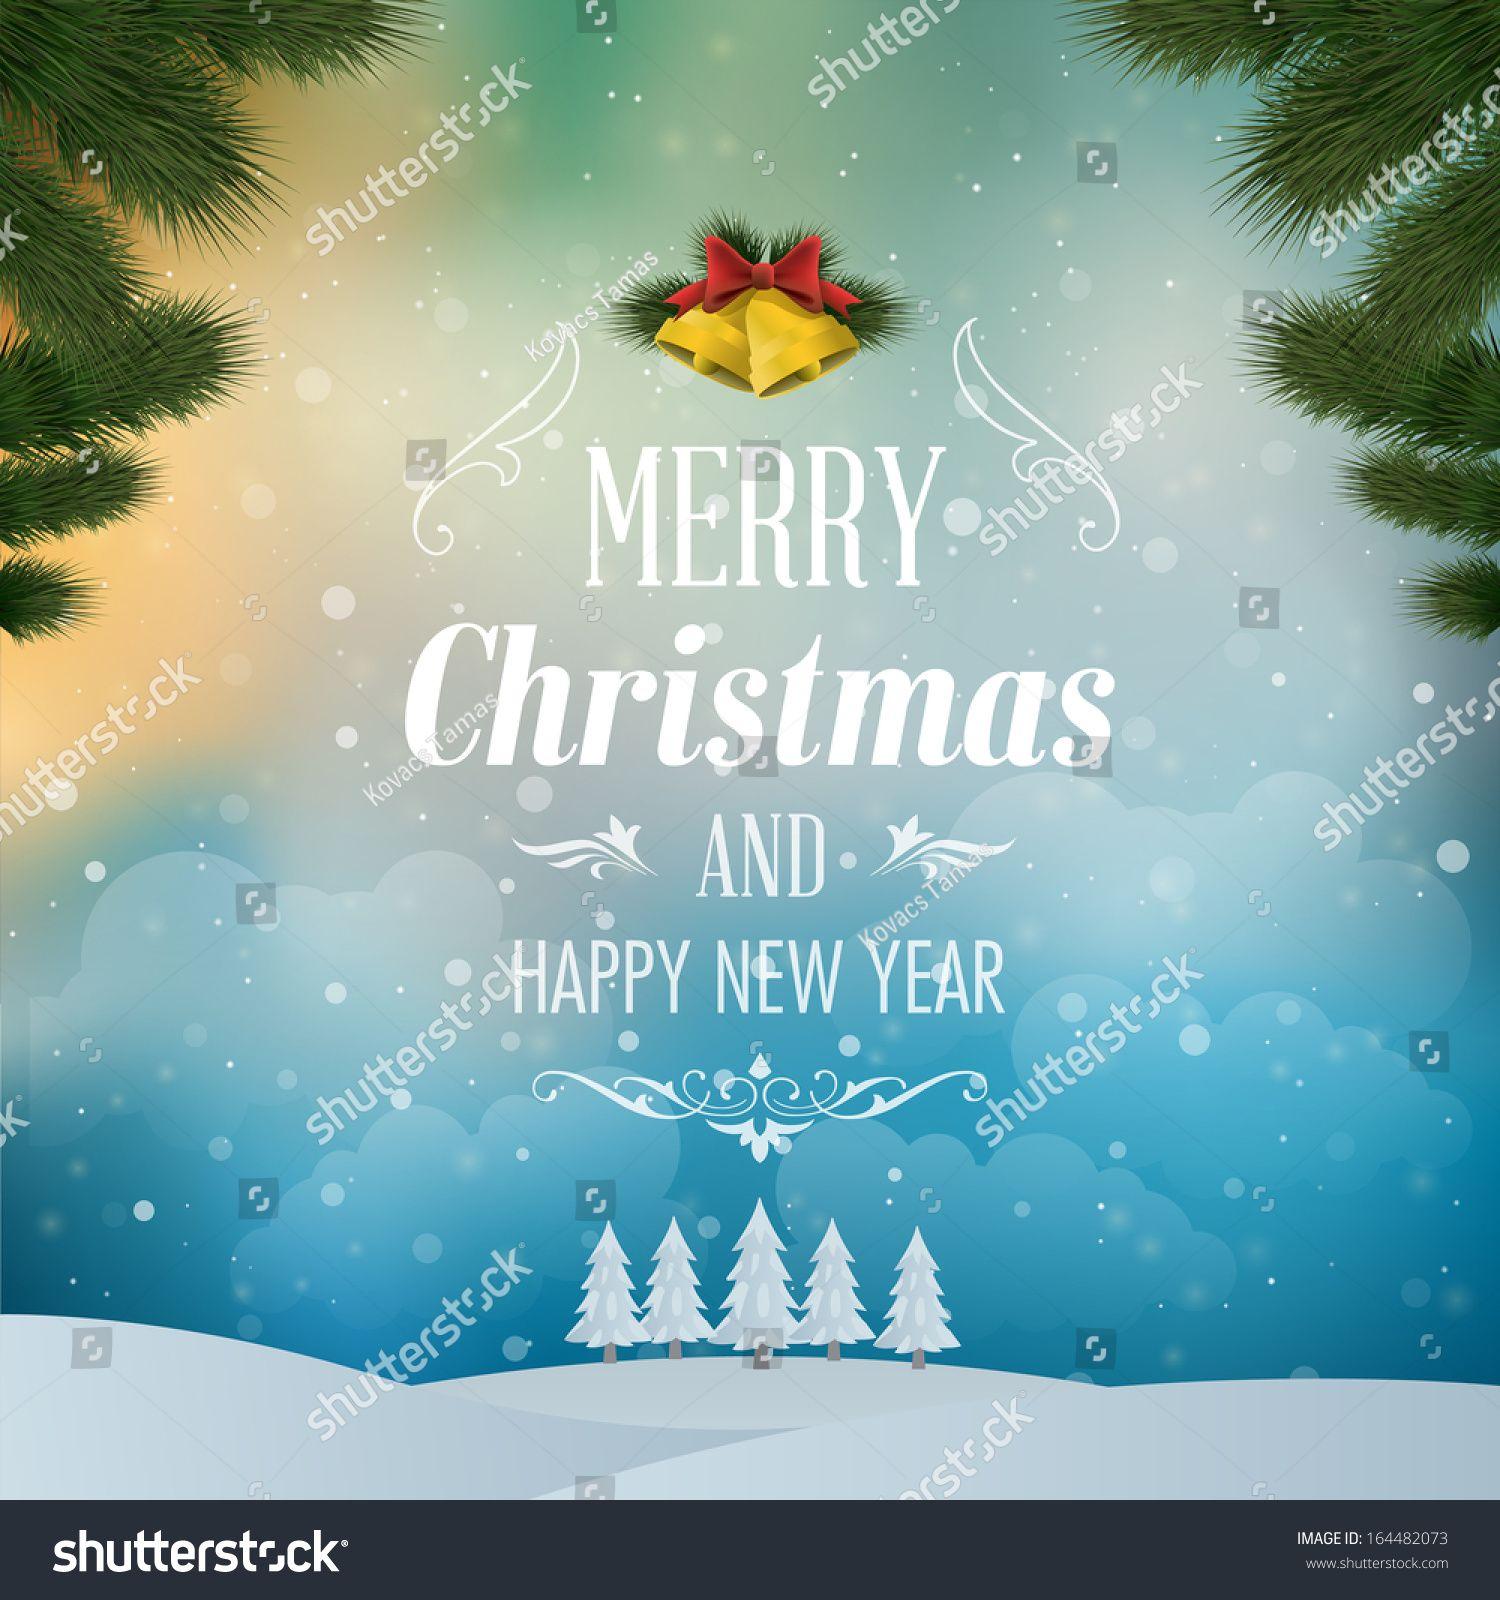 Merry Christmas Landscape Vector Illustration Ad Ad Christmas Merry Landscape Illustratio Christmas Backdrops Christmas Landscape Merry Christmas Banner